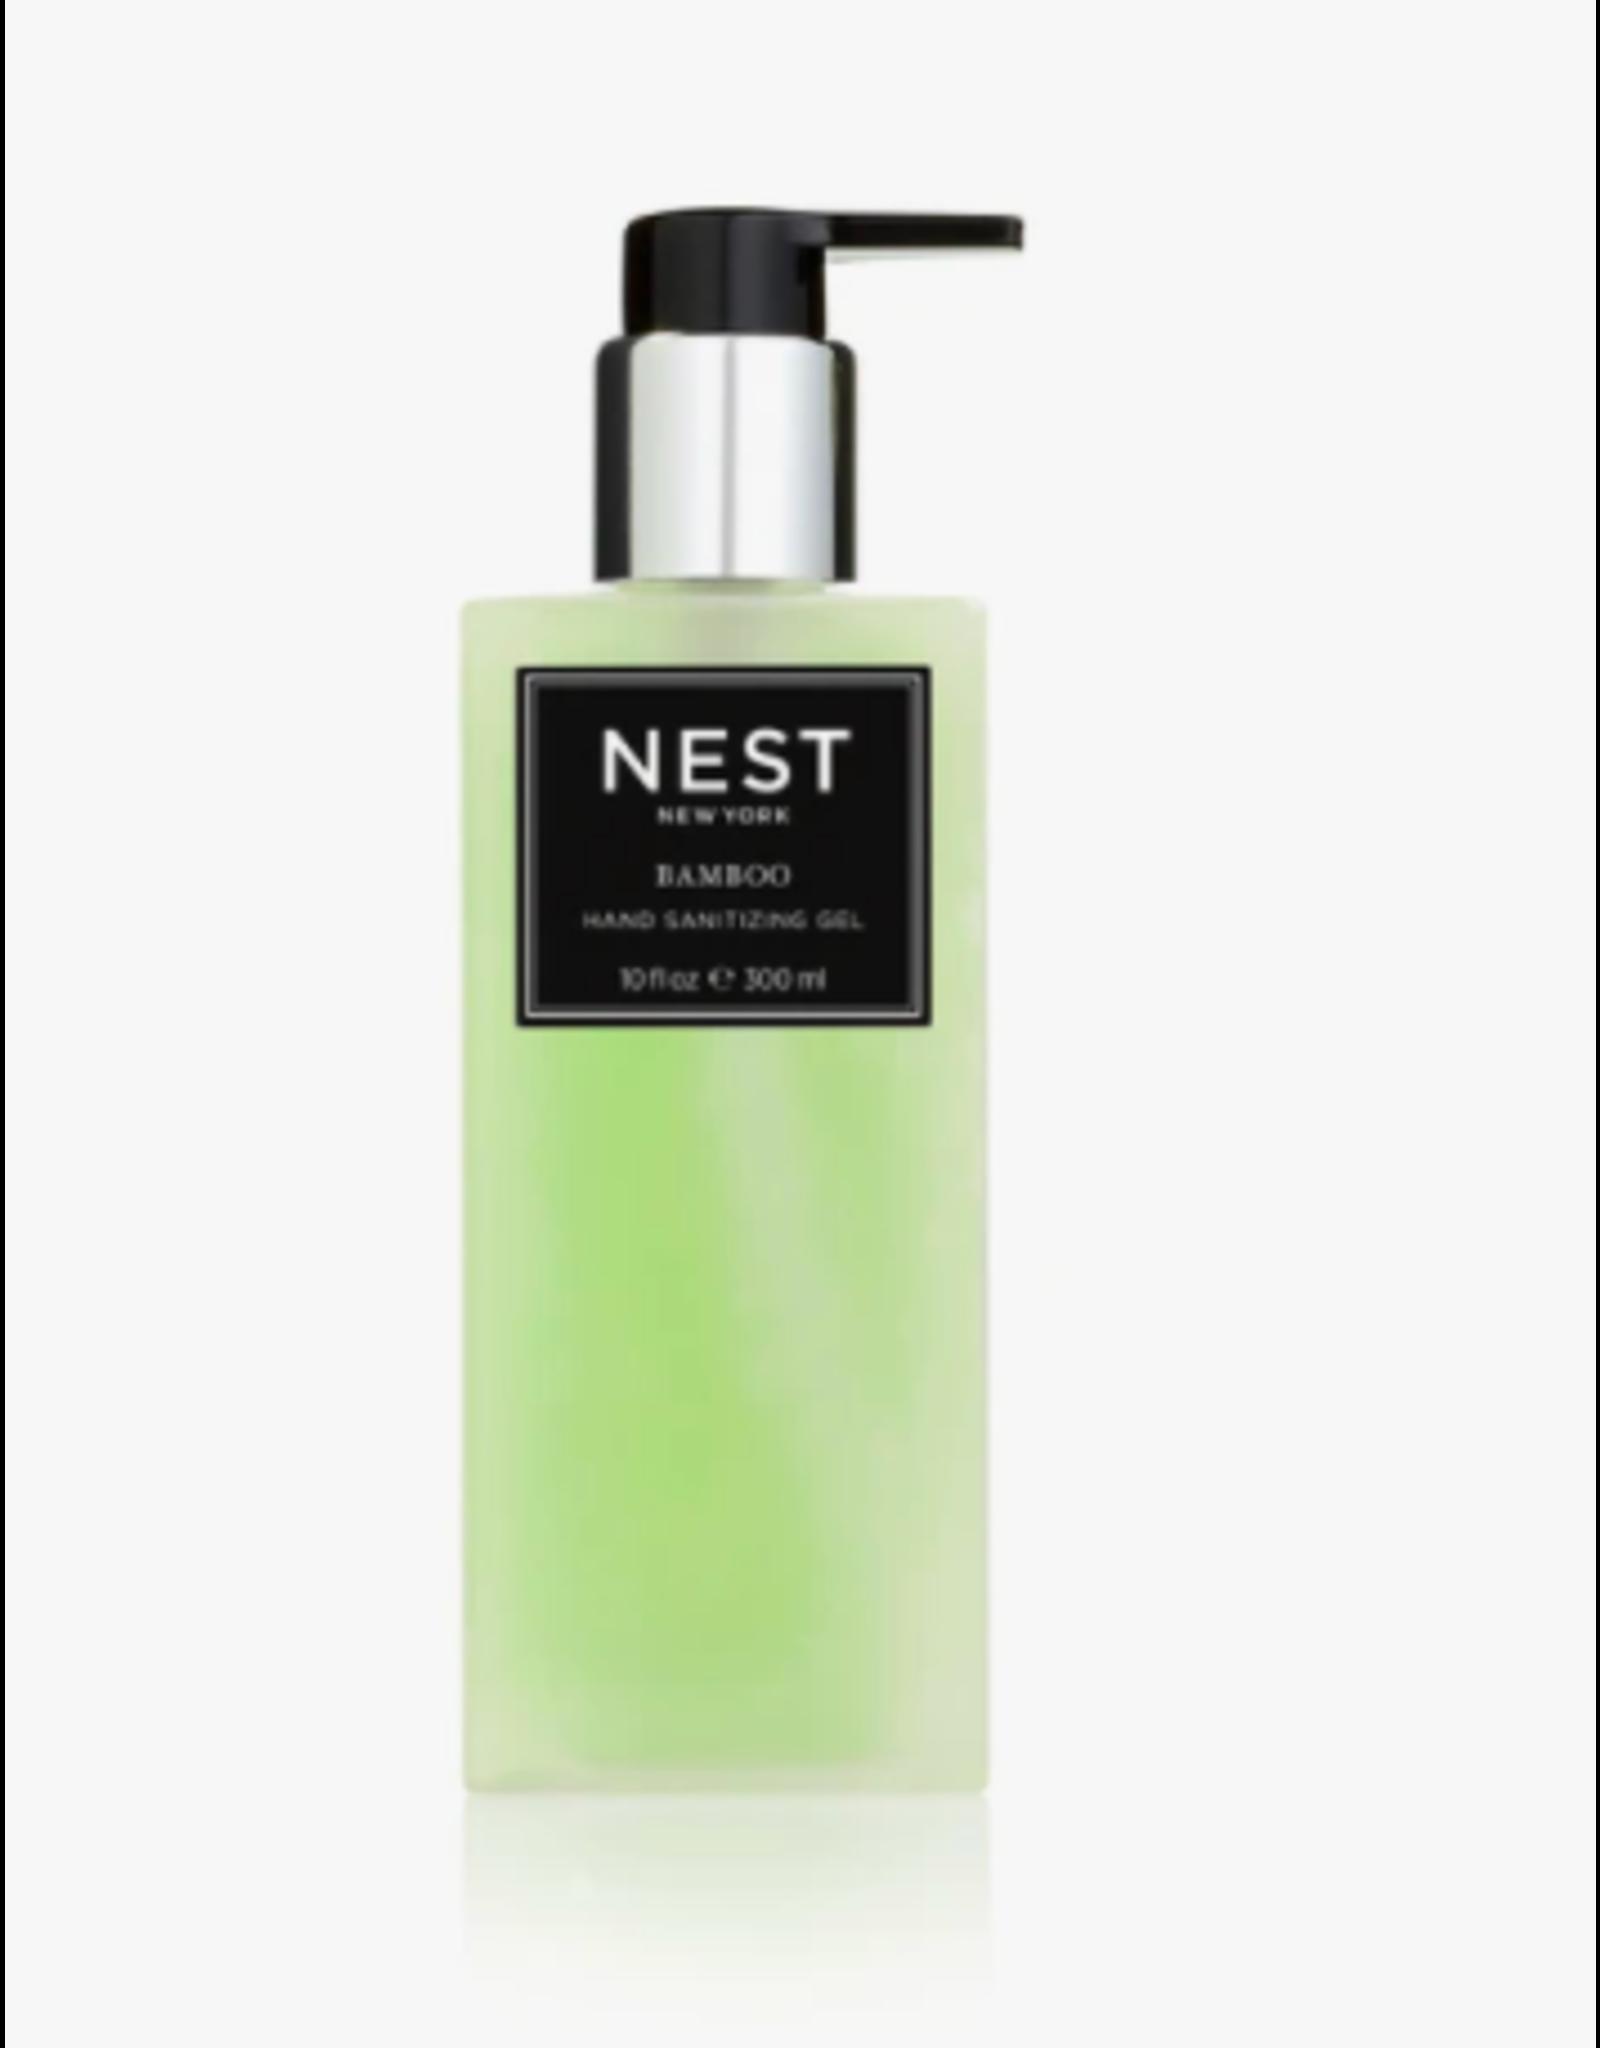 Nest Fragrances Bamboo Hand Sanitzer Pump Bottle